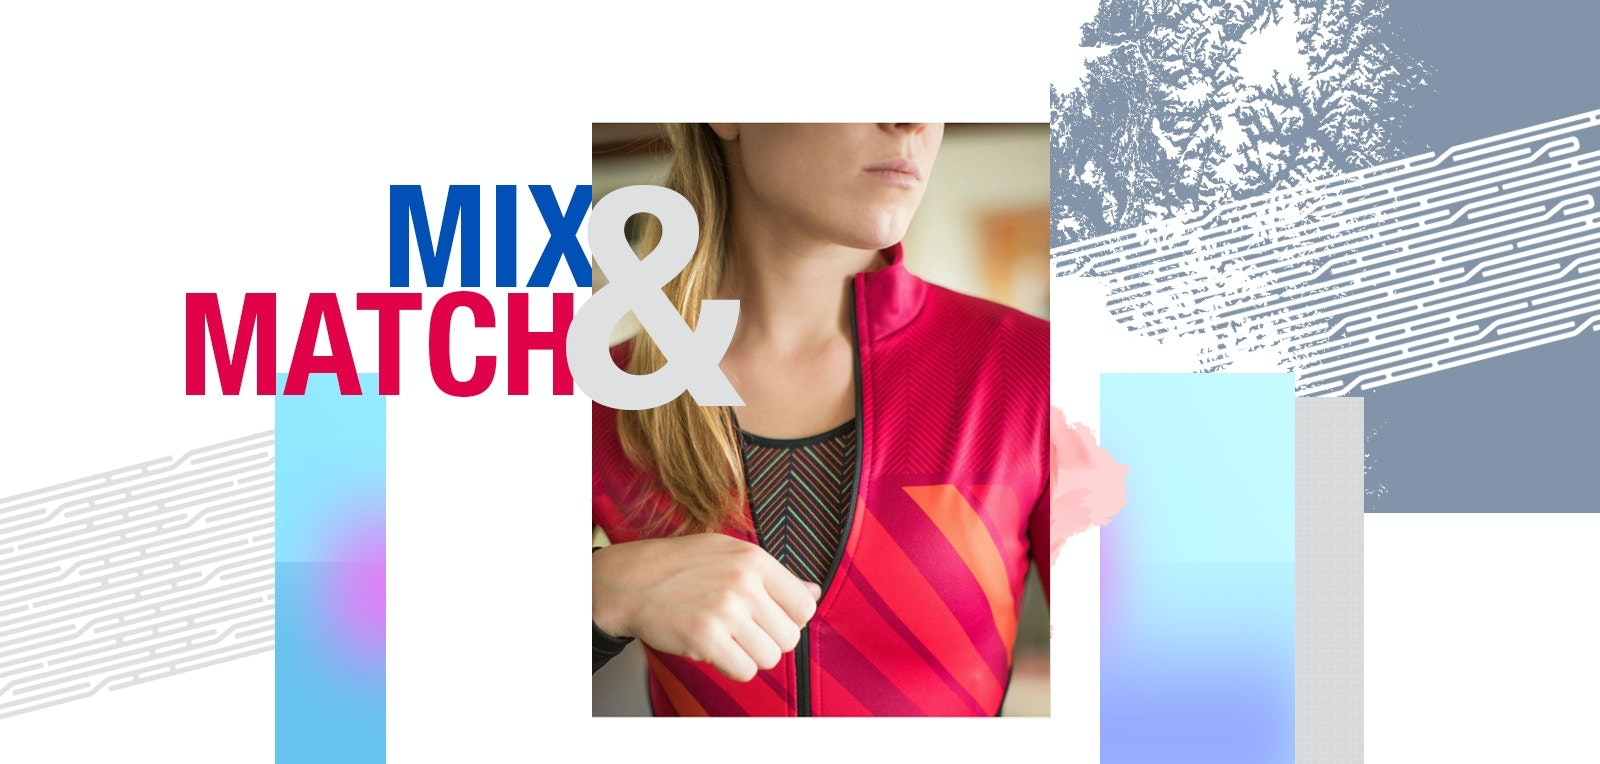 Mix & Match Santini Australia